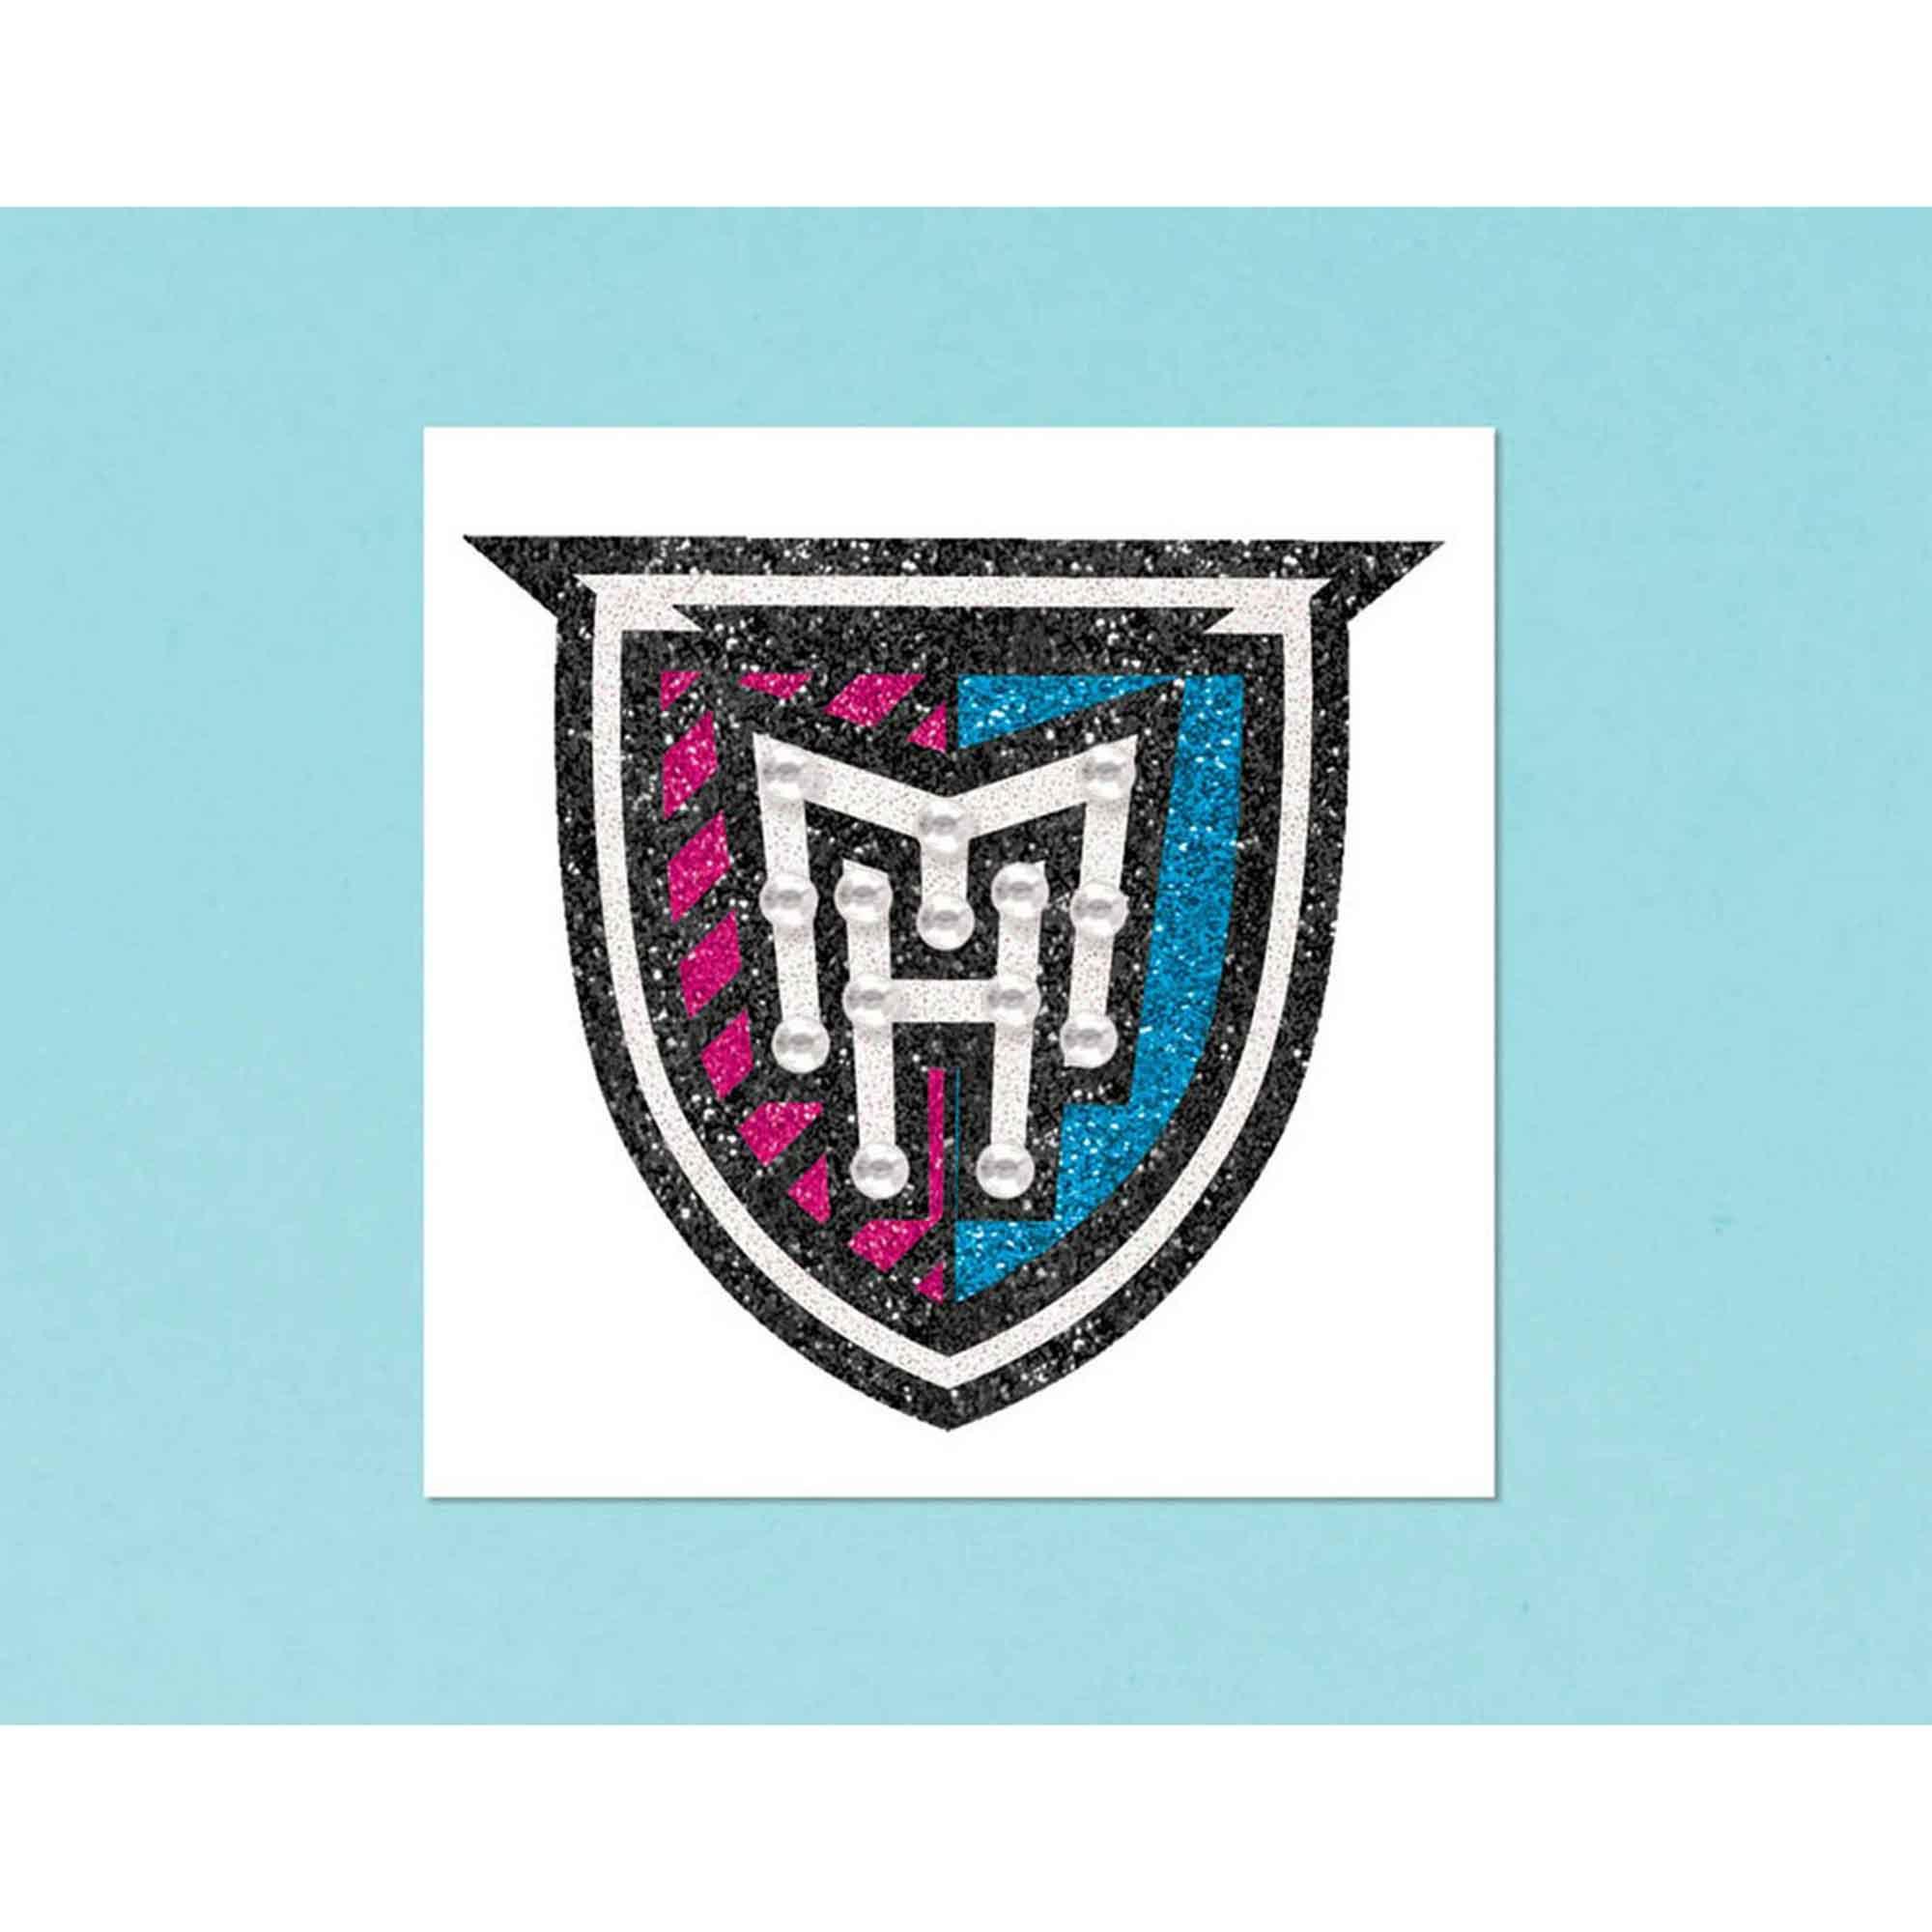 Monster High Crest Body Jewelry